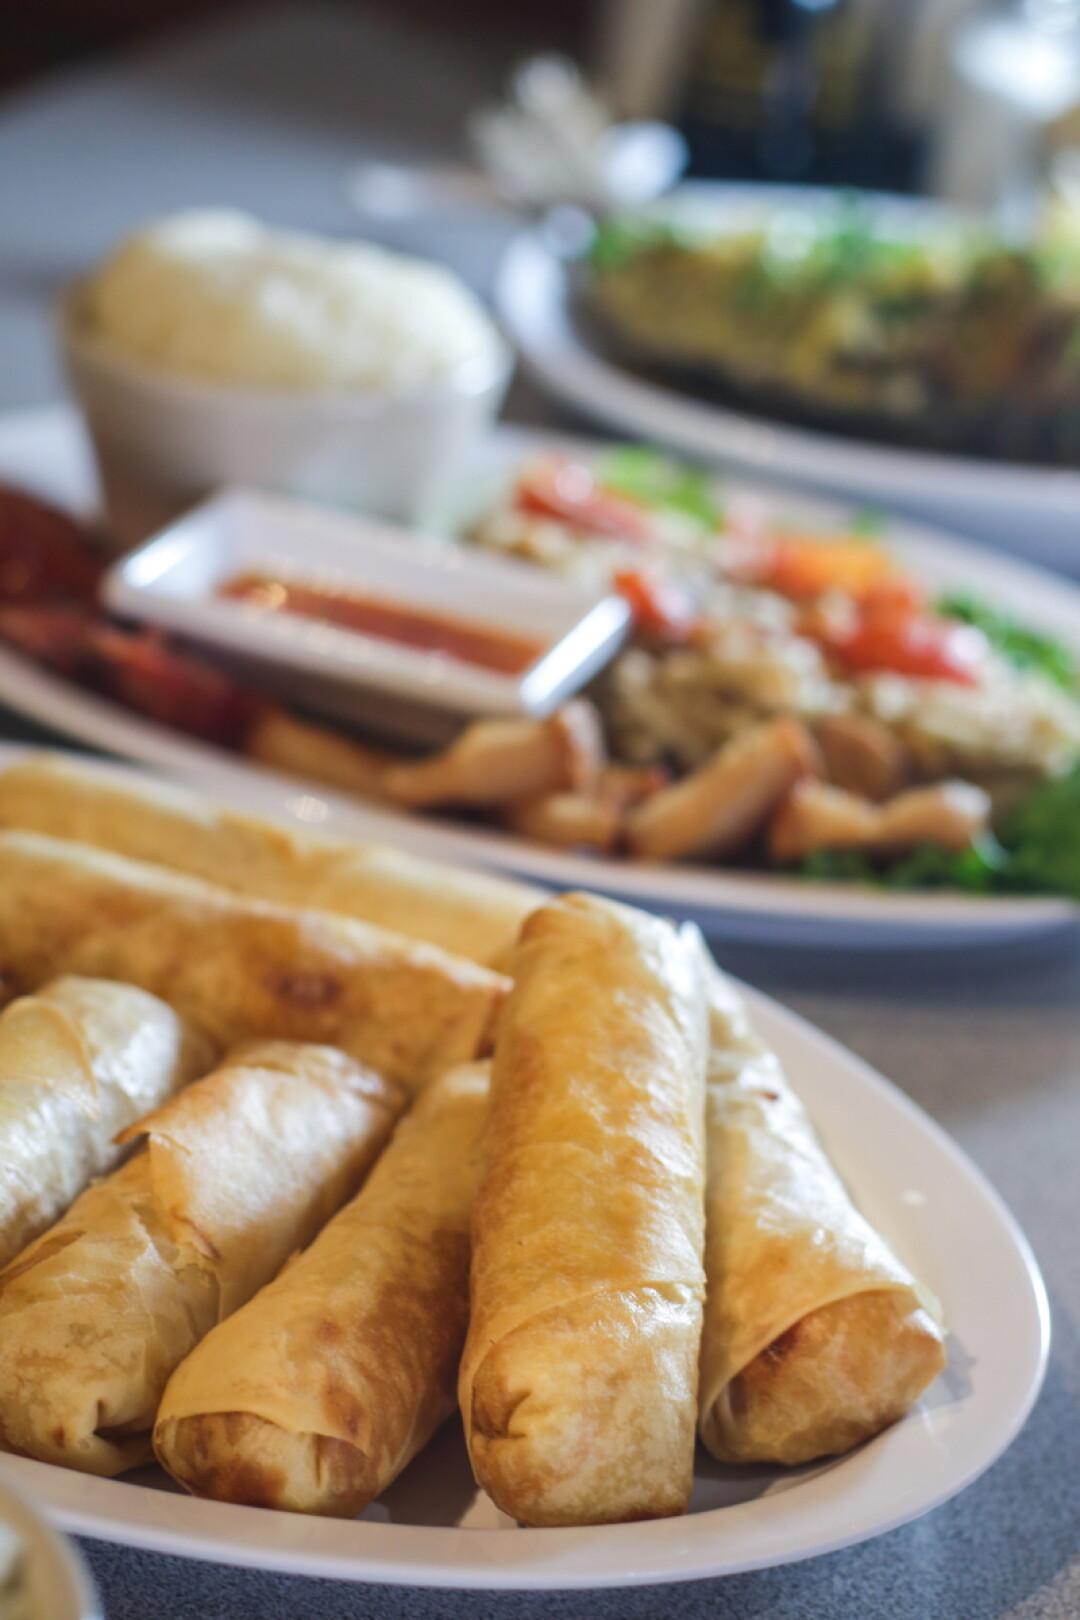 Father Daughter Team Follow Dream To Open Thai Restaurant In